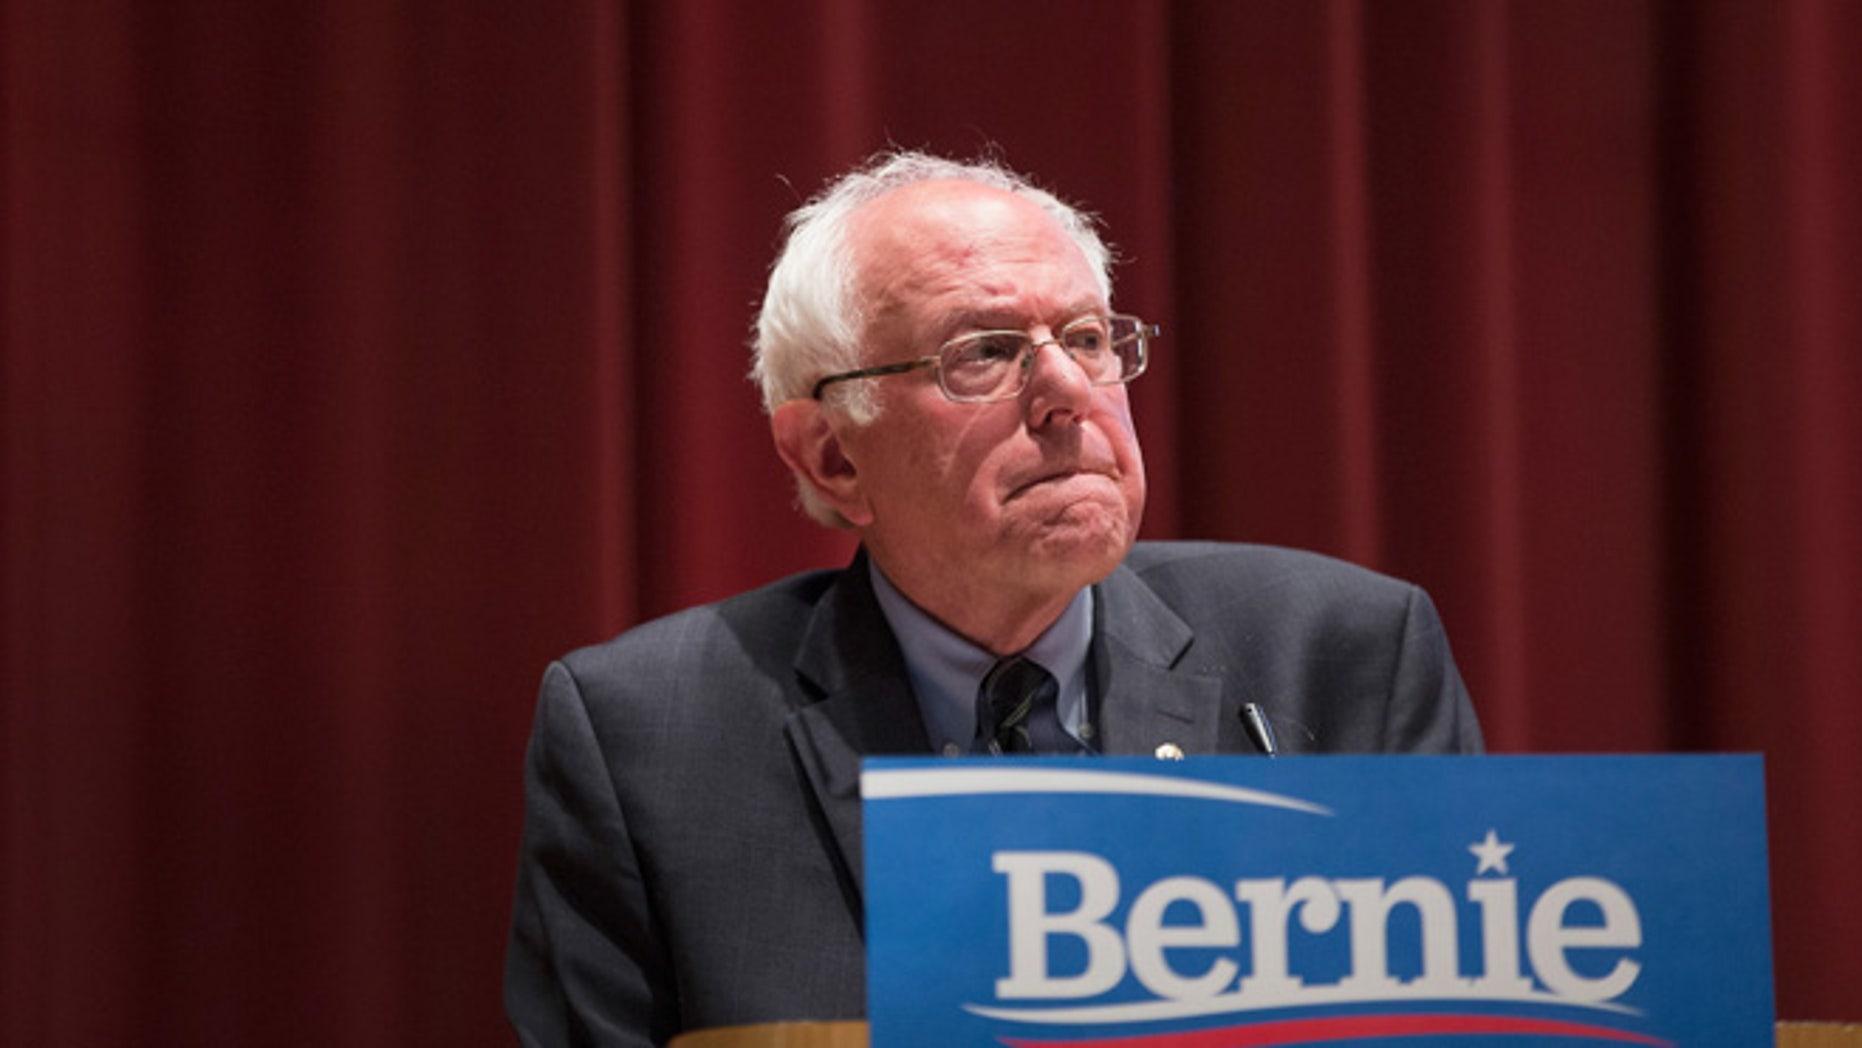 Sen. Bernie Sanders  at Drake University on June 12, 2015 in Des Moines, Iowa.